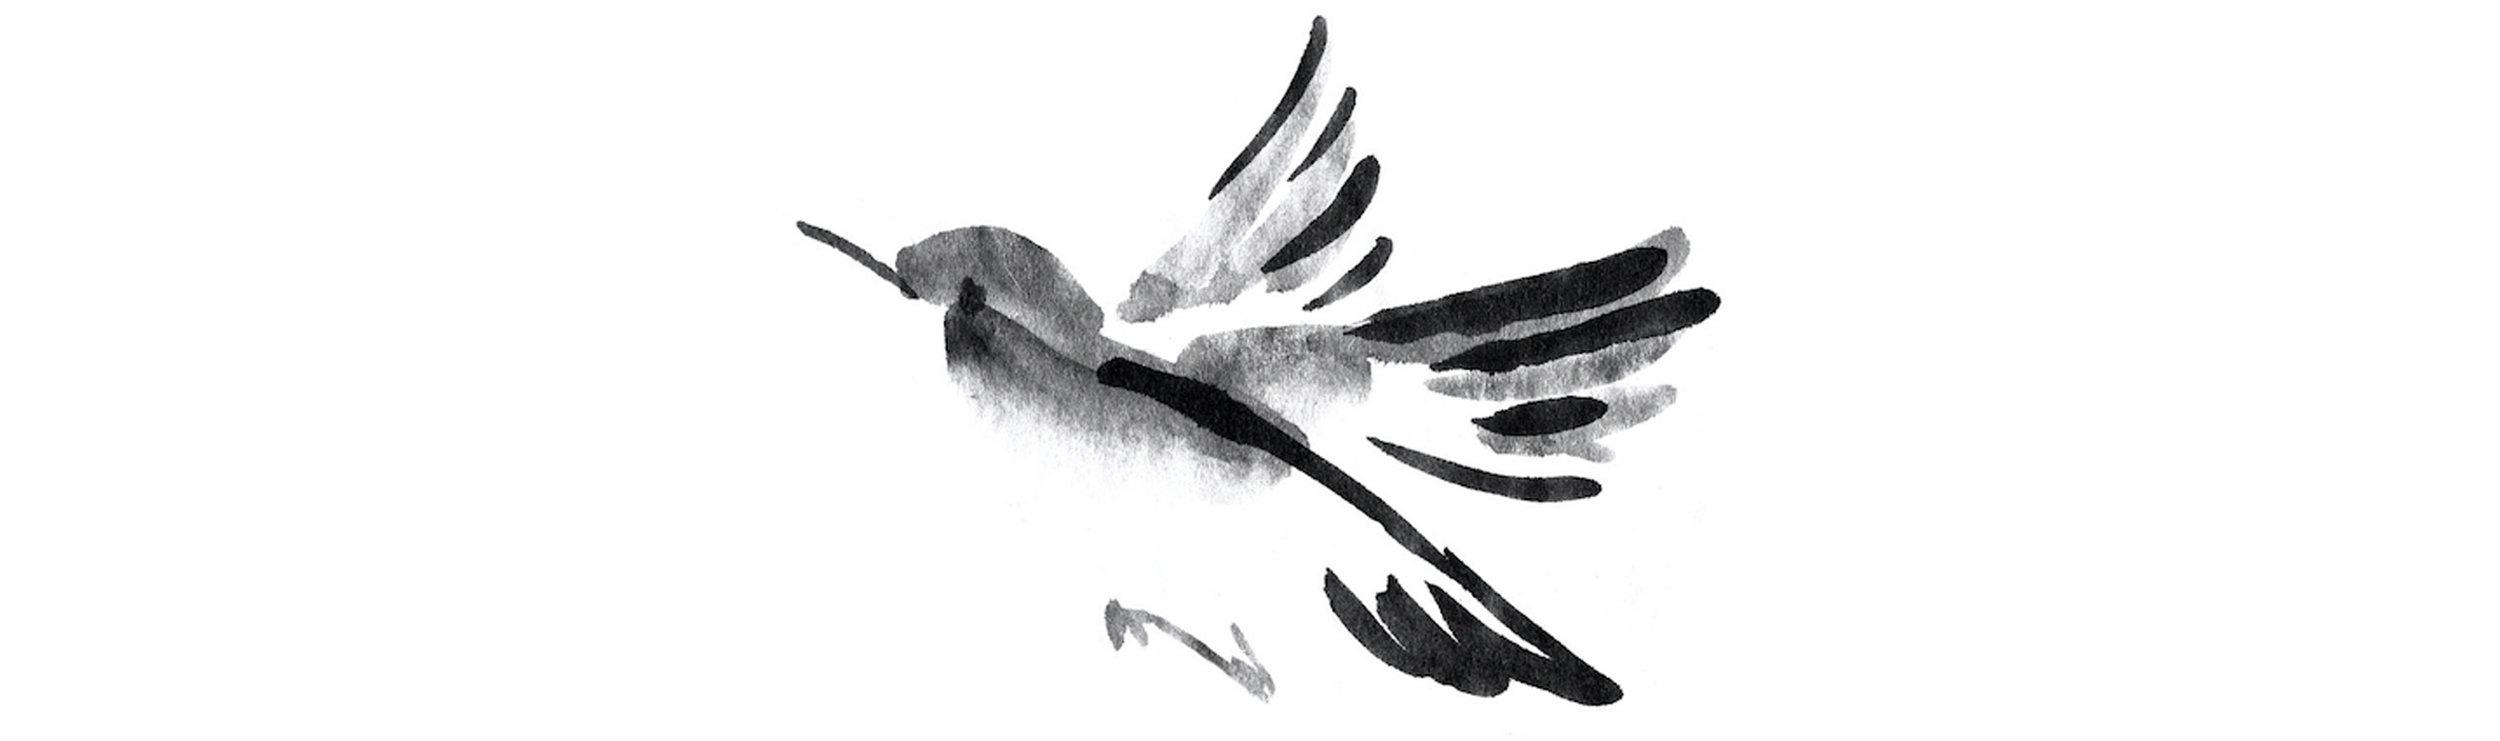 birds breaker4.jpg